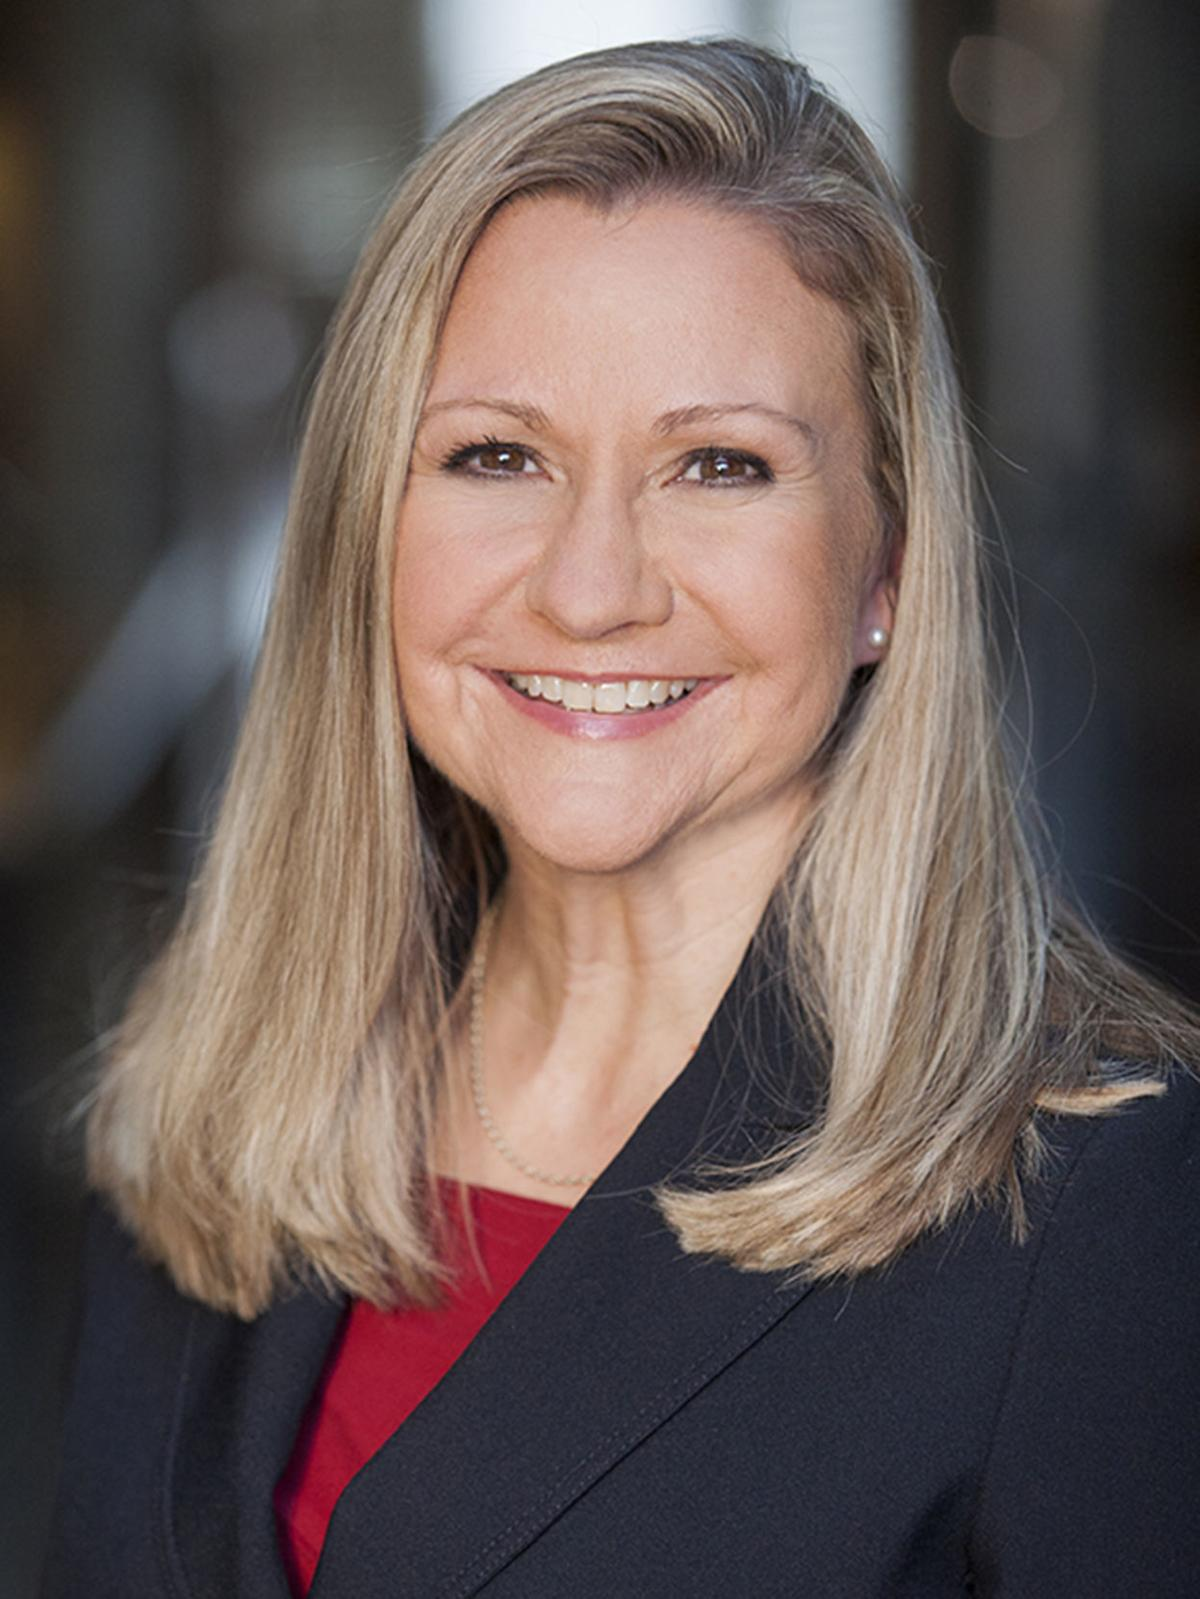 Sen. Amanda Chase, R-Chesterfield